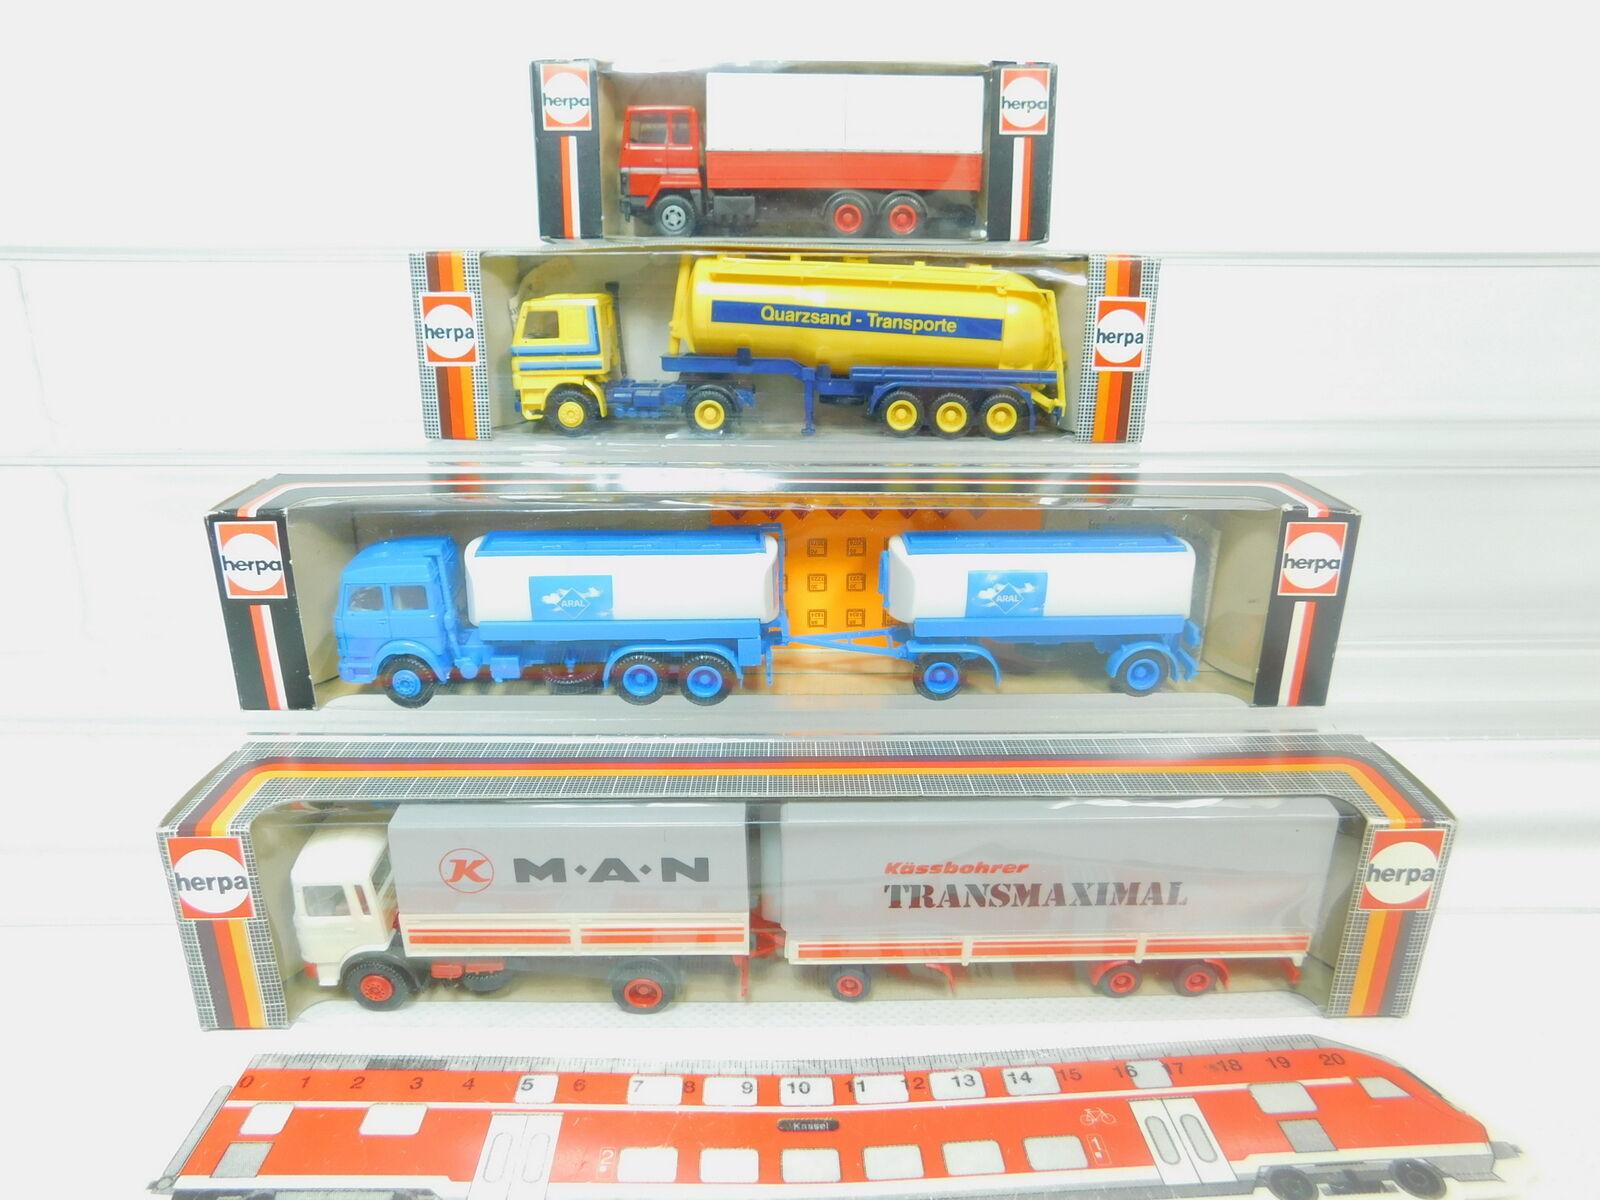 Bo925-0, 5  4x Herpa 1 87 Camions  813371 MAGIRUS 822500 SCANIA 820321805290 Top  neuf dans sa boîte